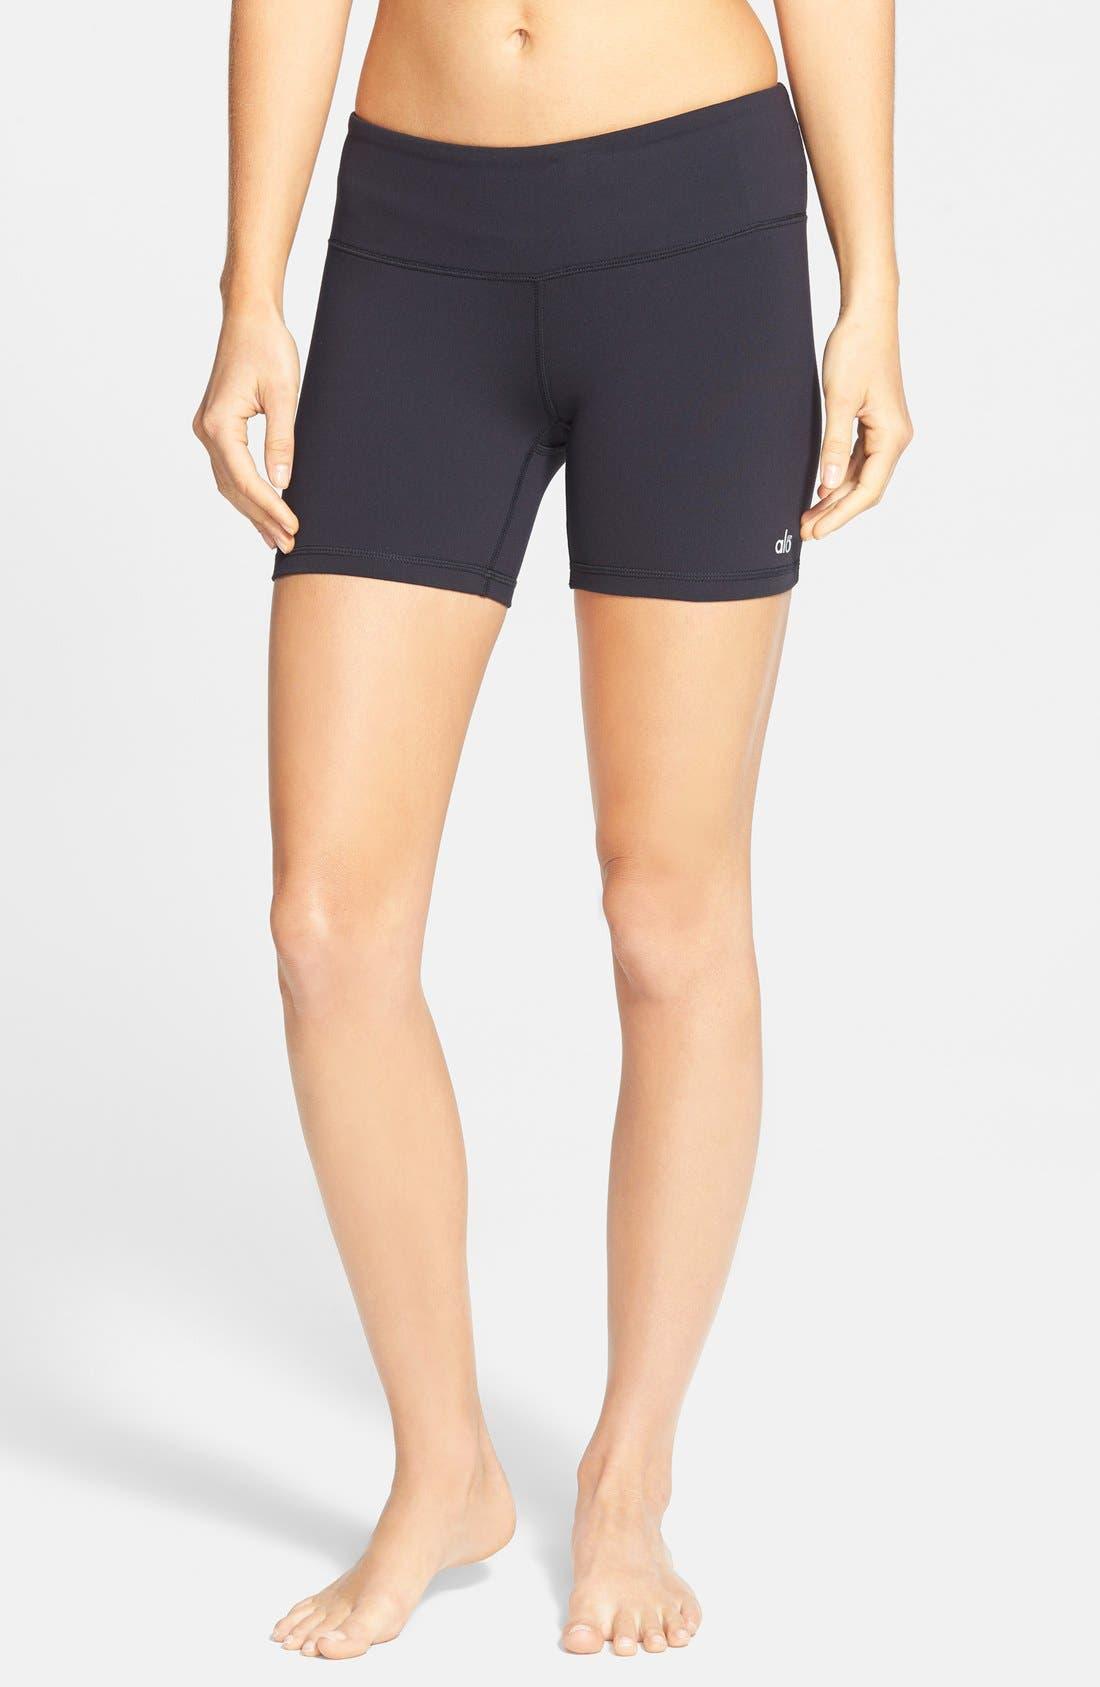 'Burn' Shorts,                             Main thumbnail 1, color,                             BLACK